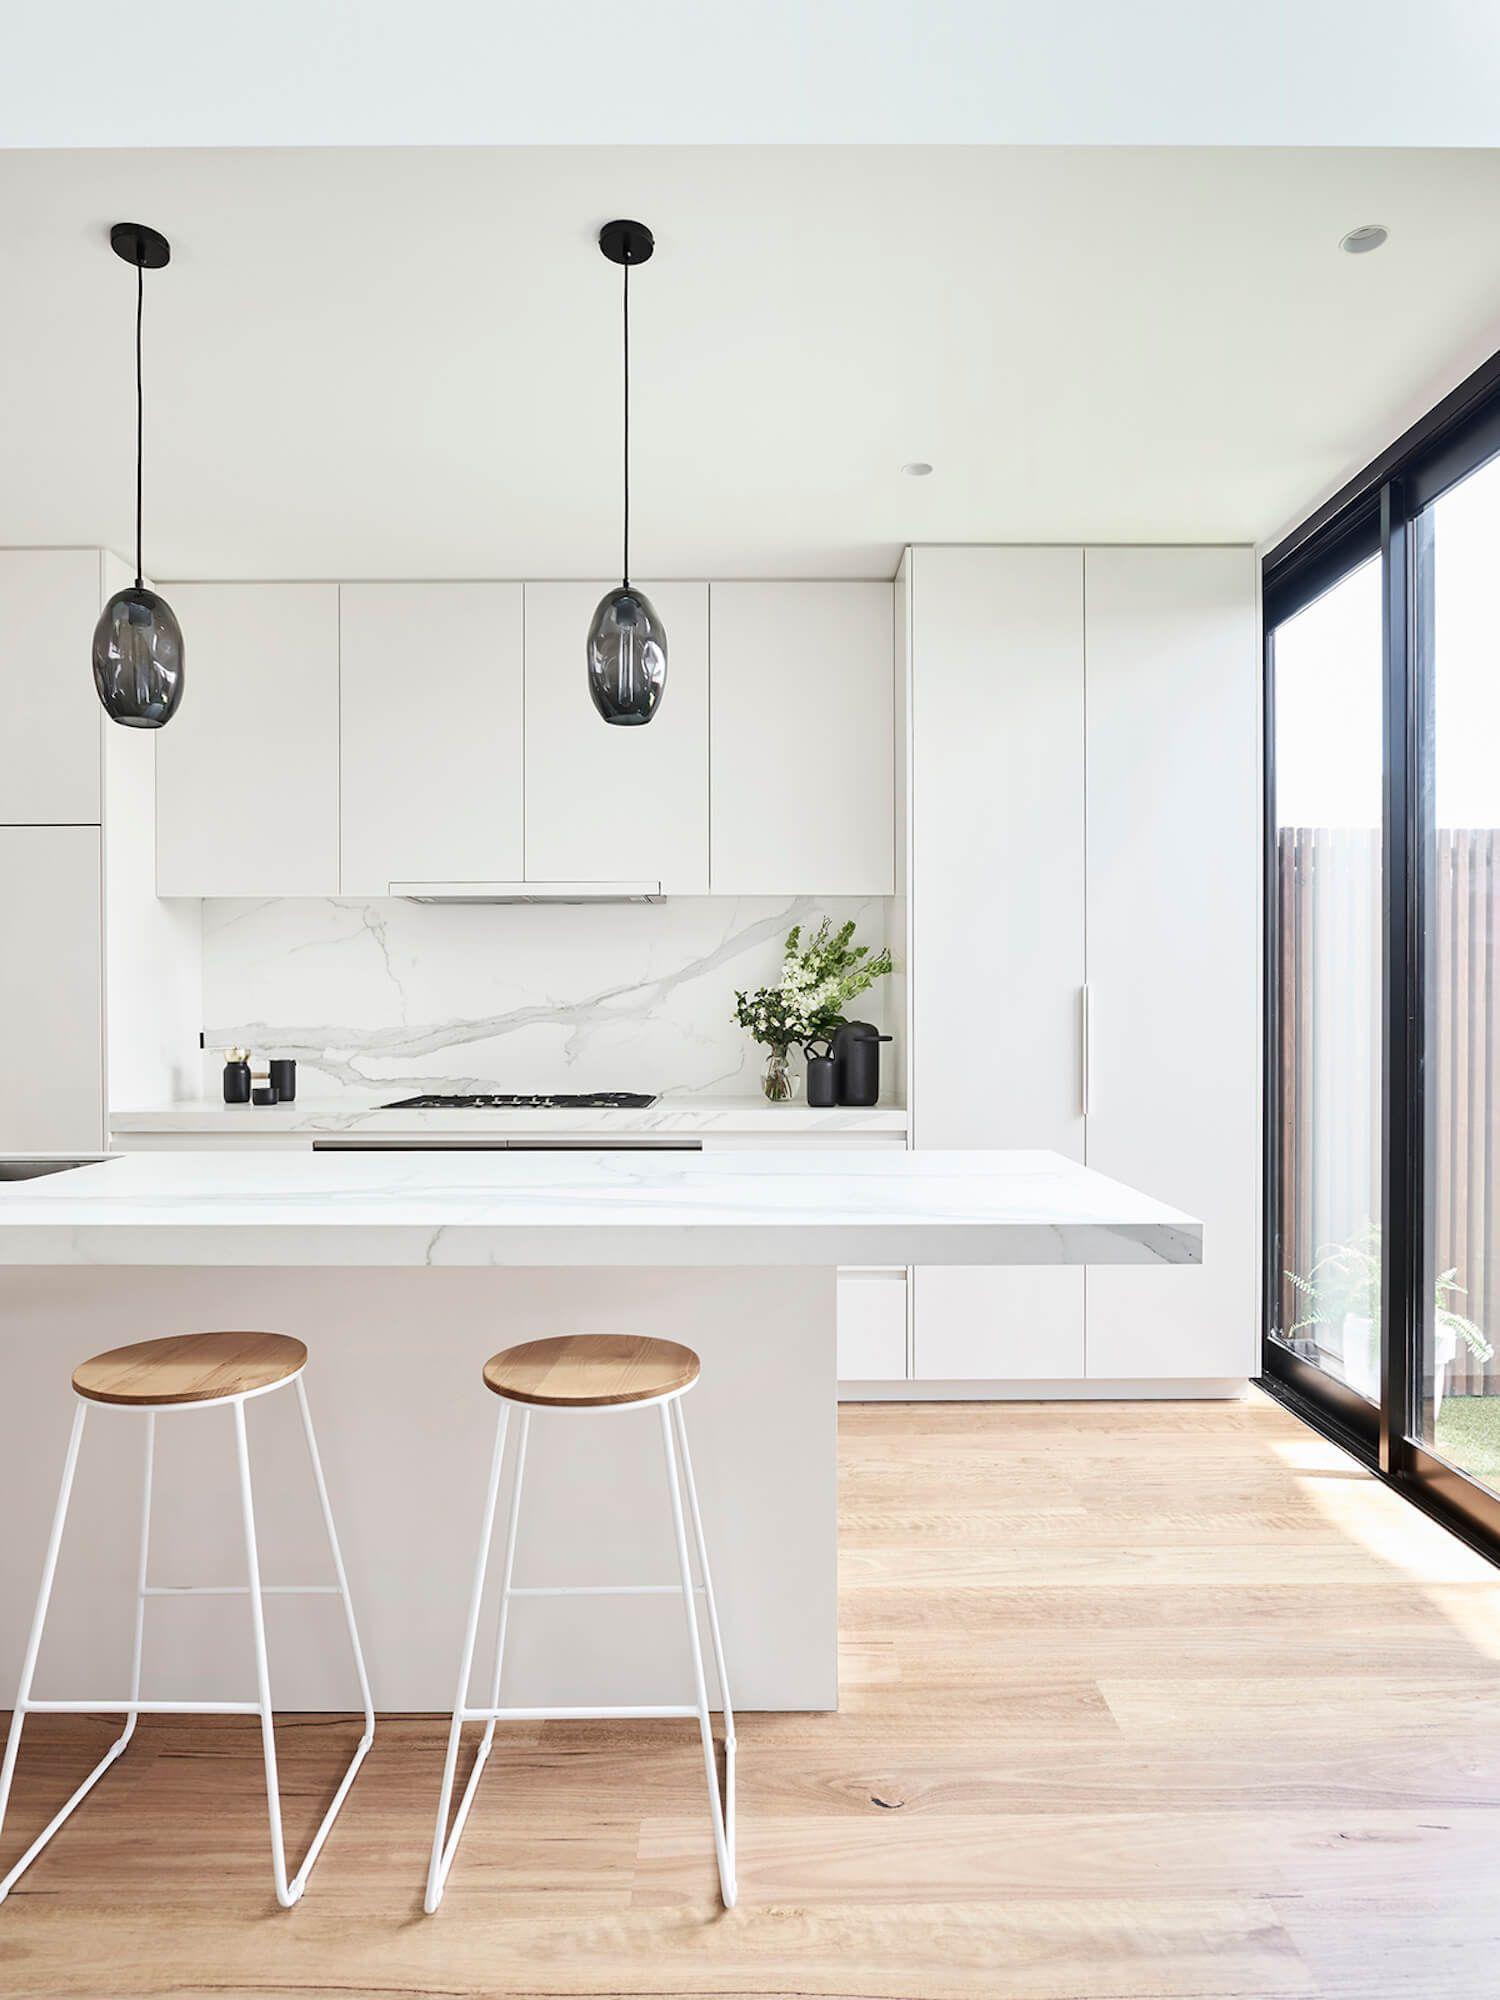 Home Terrace Garden Inspirations White Kitchen Interior Interior Design Kitchen Modern Kitchen Design